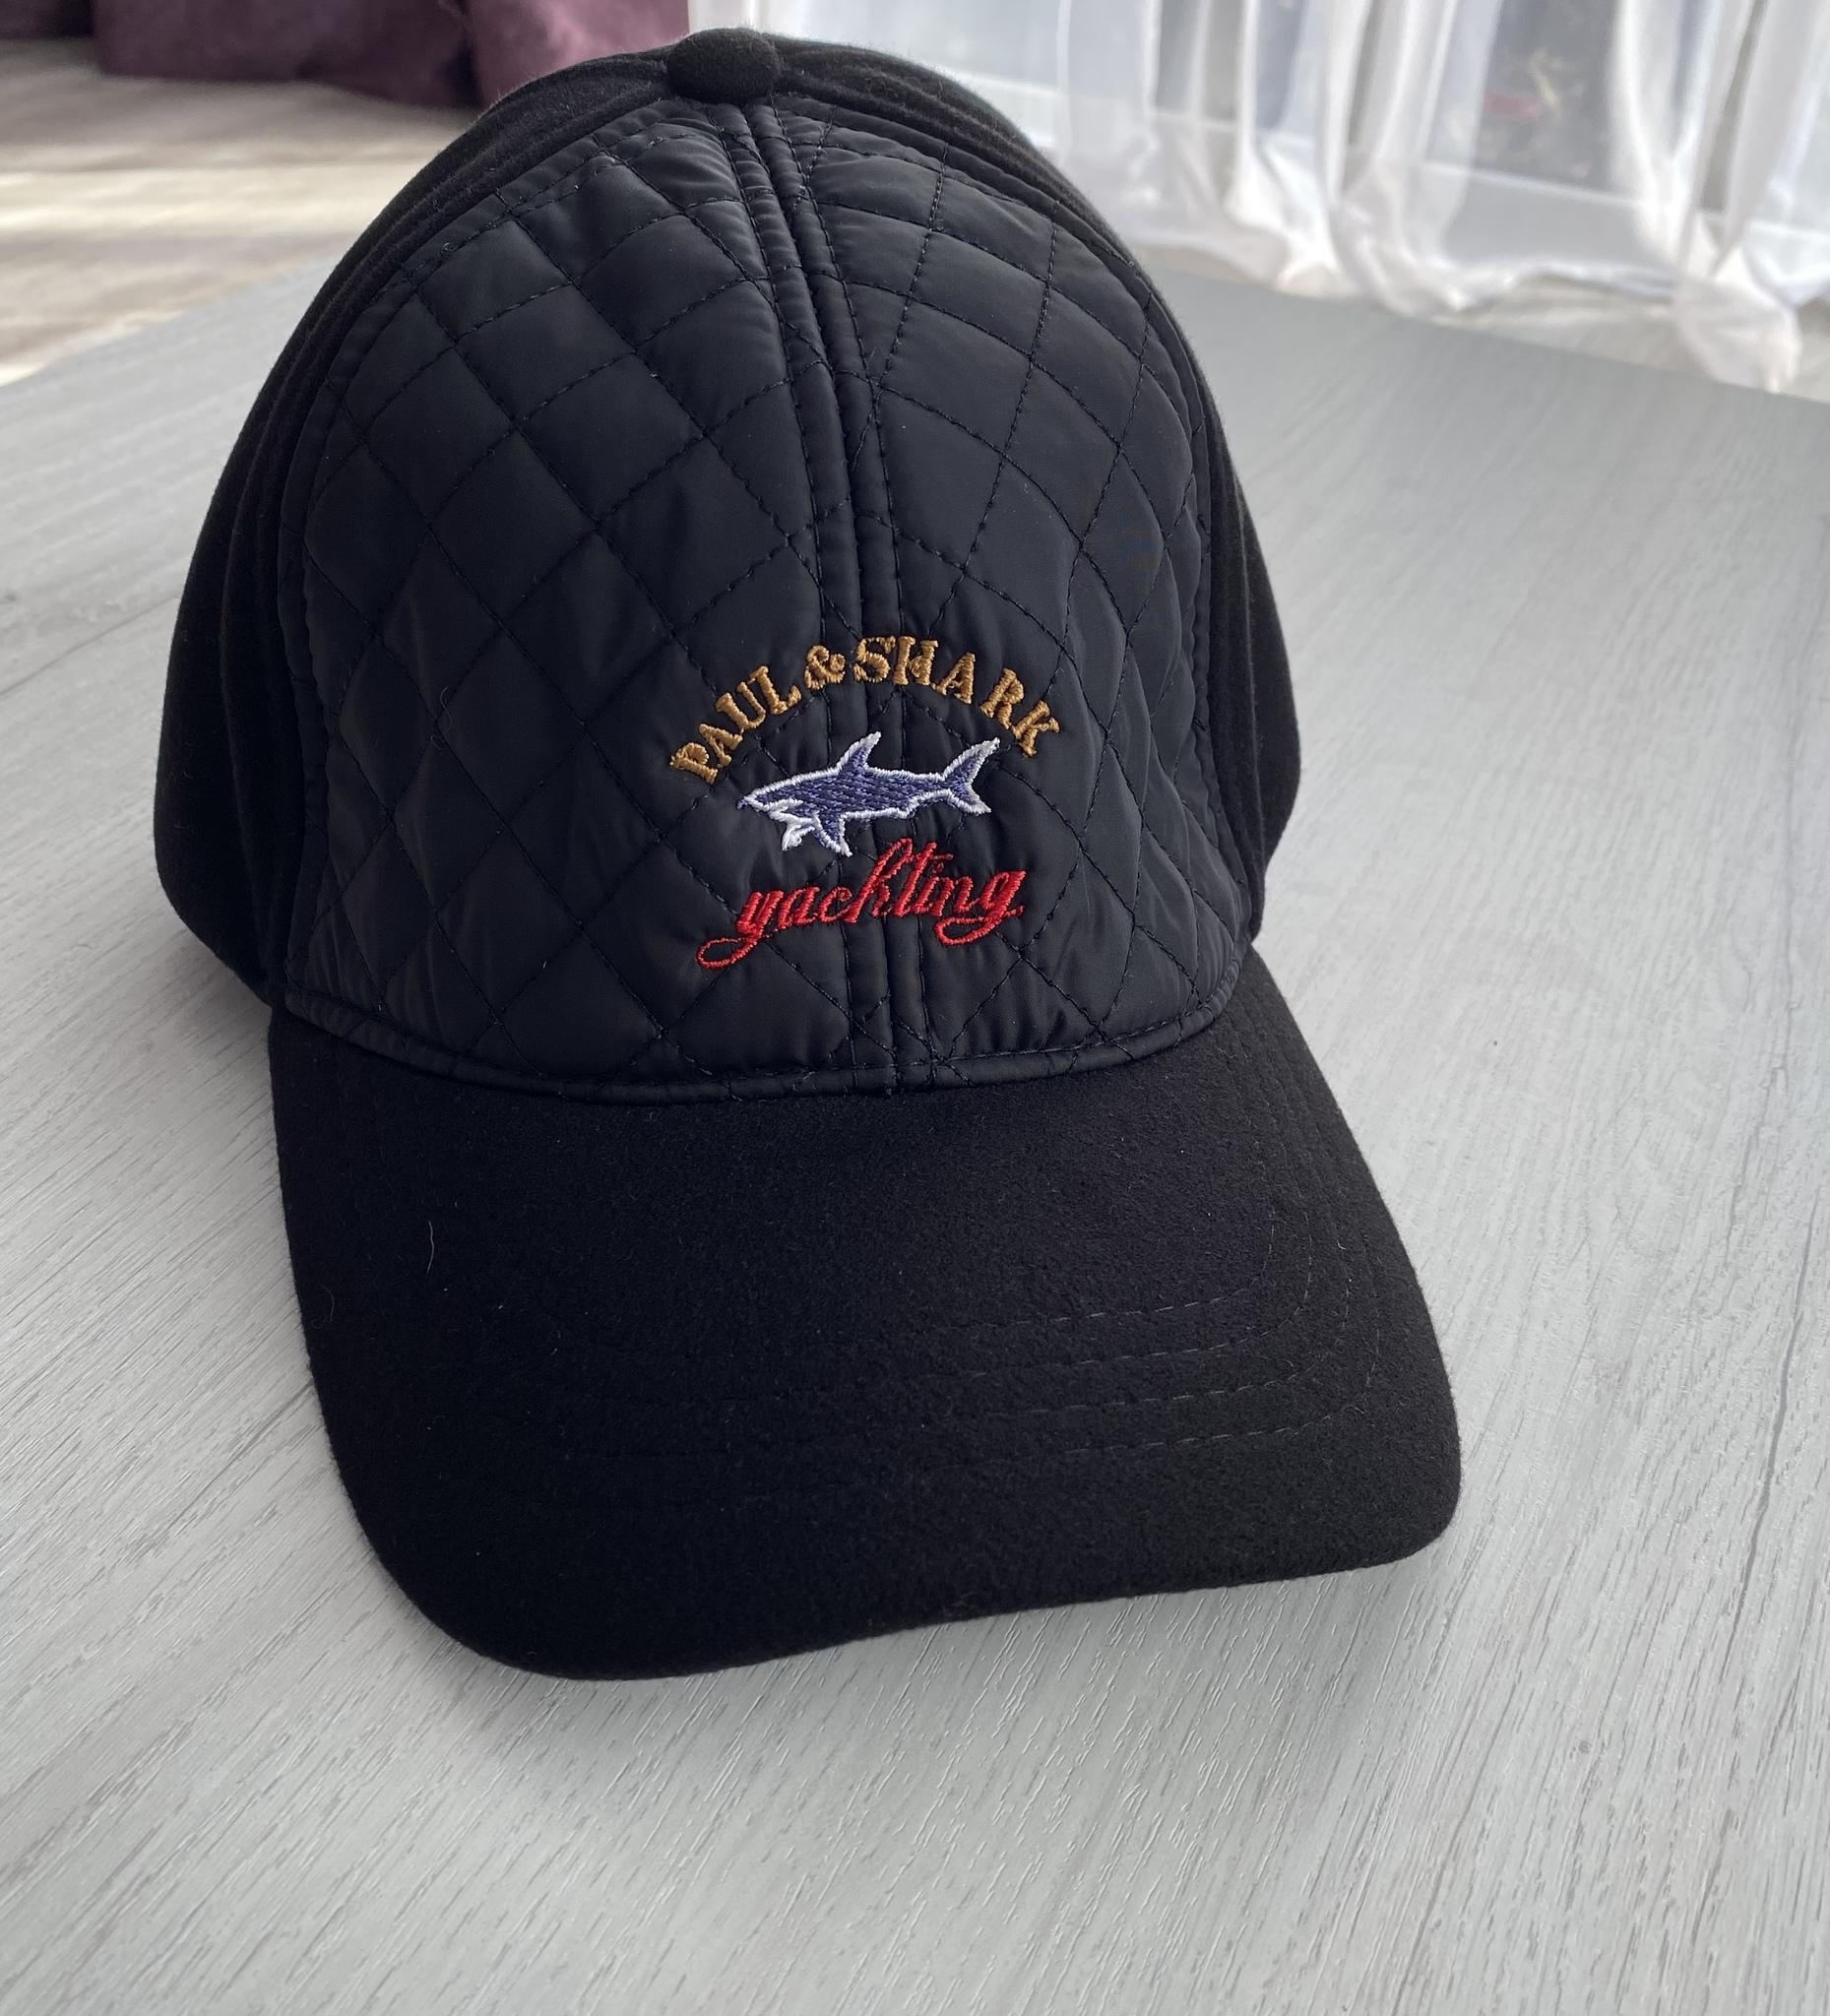 "Мужские шапки и кепки Paul Shark Утепленная кепка""Paul and Shark"" №3 DBF6C476-655D-4166-B97D-FECECEEE0EED.jpeg"